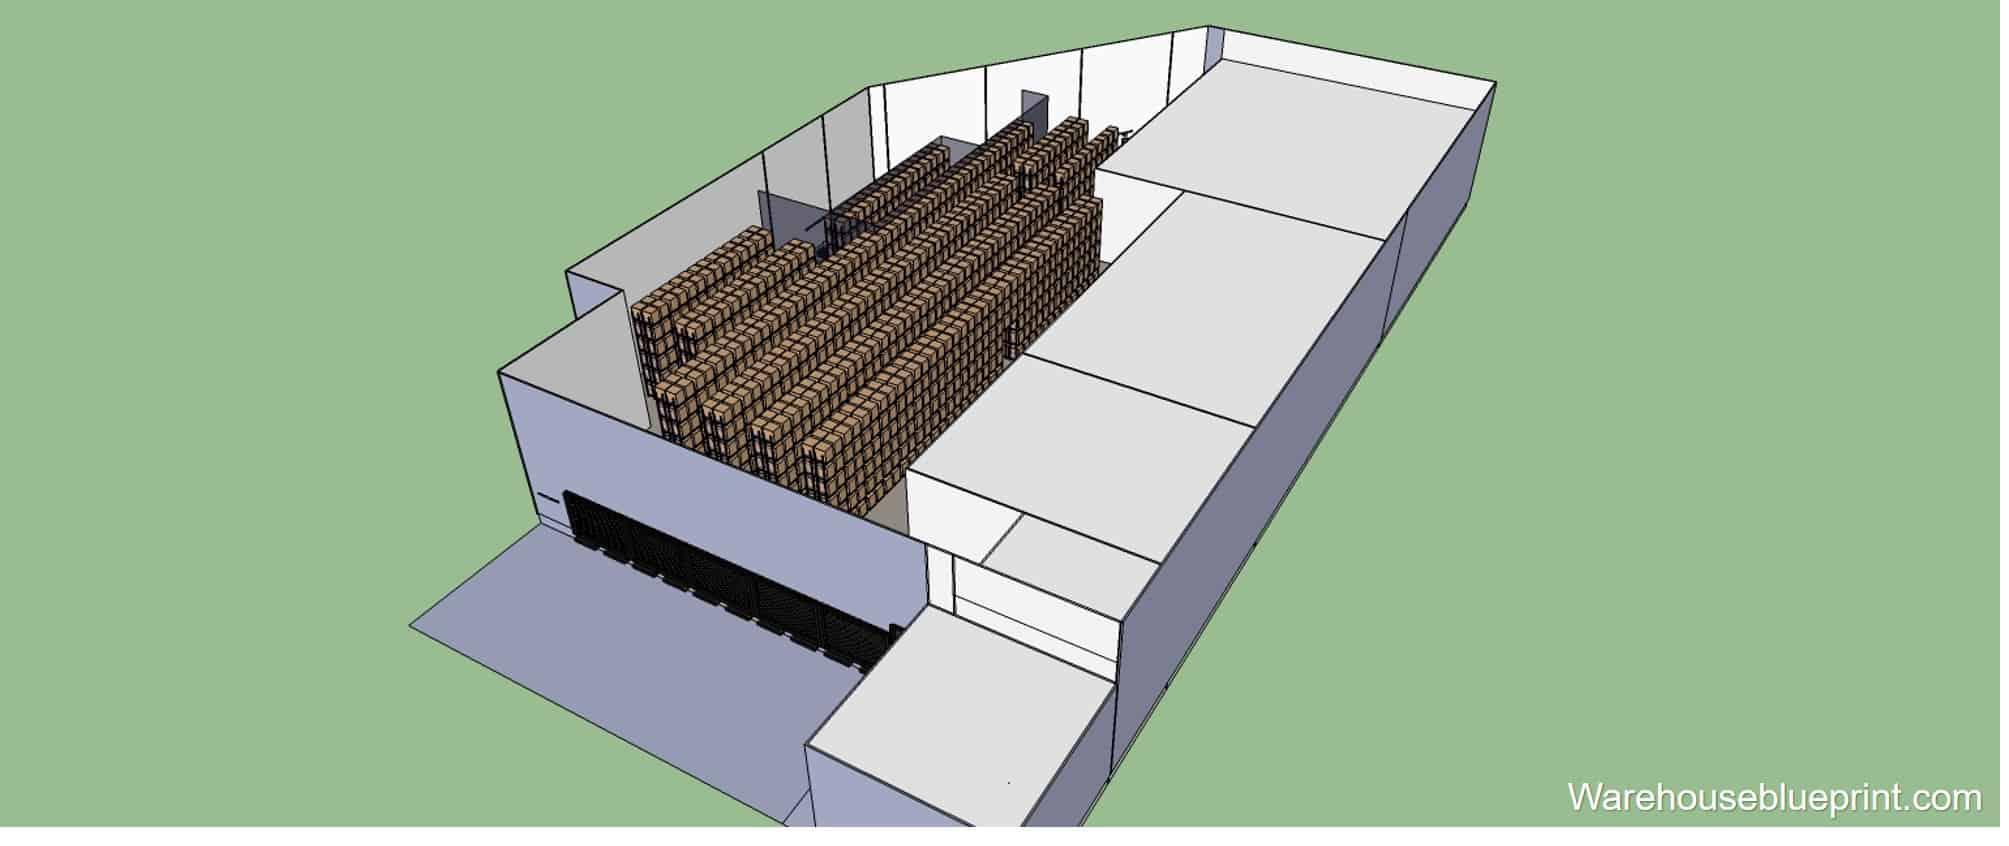 Warehouse Layout 2